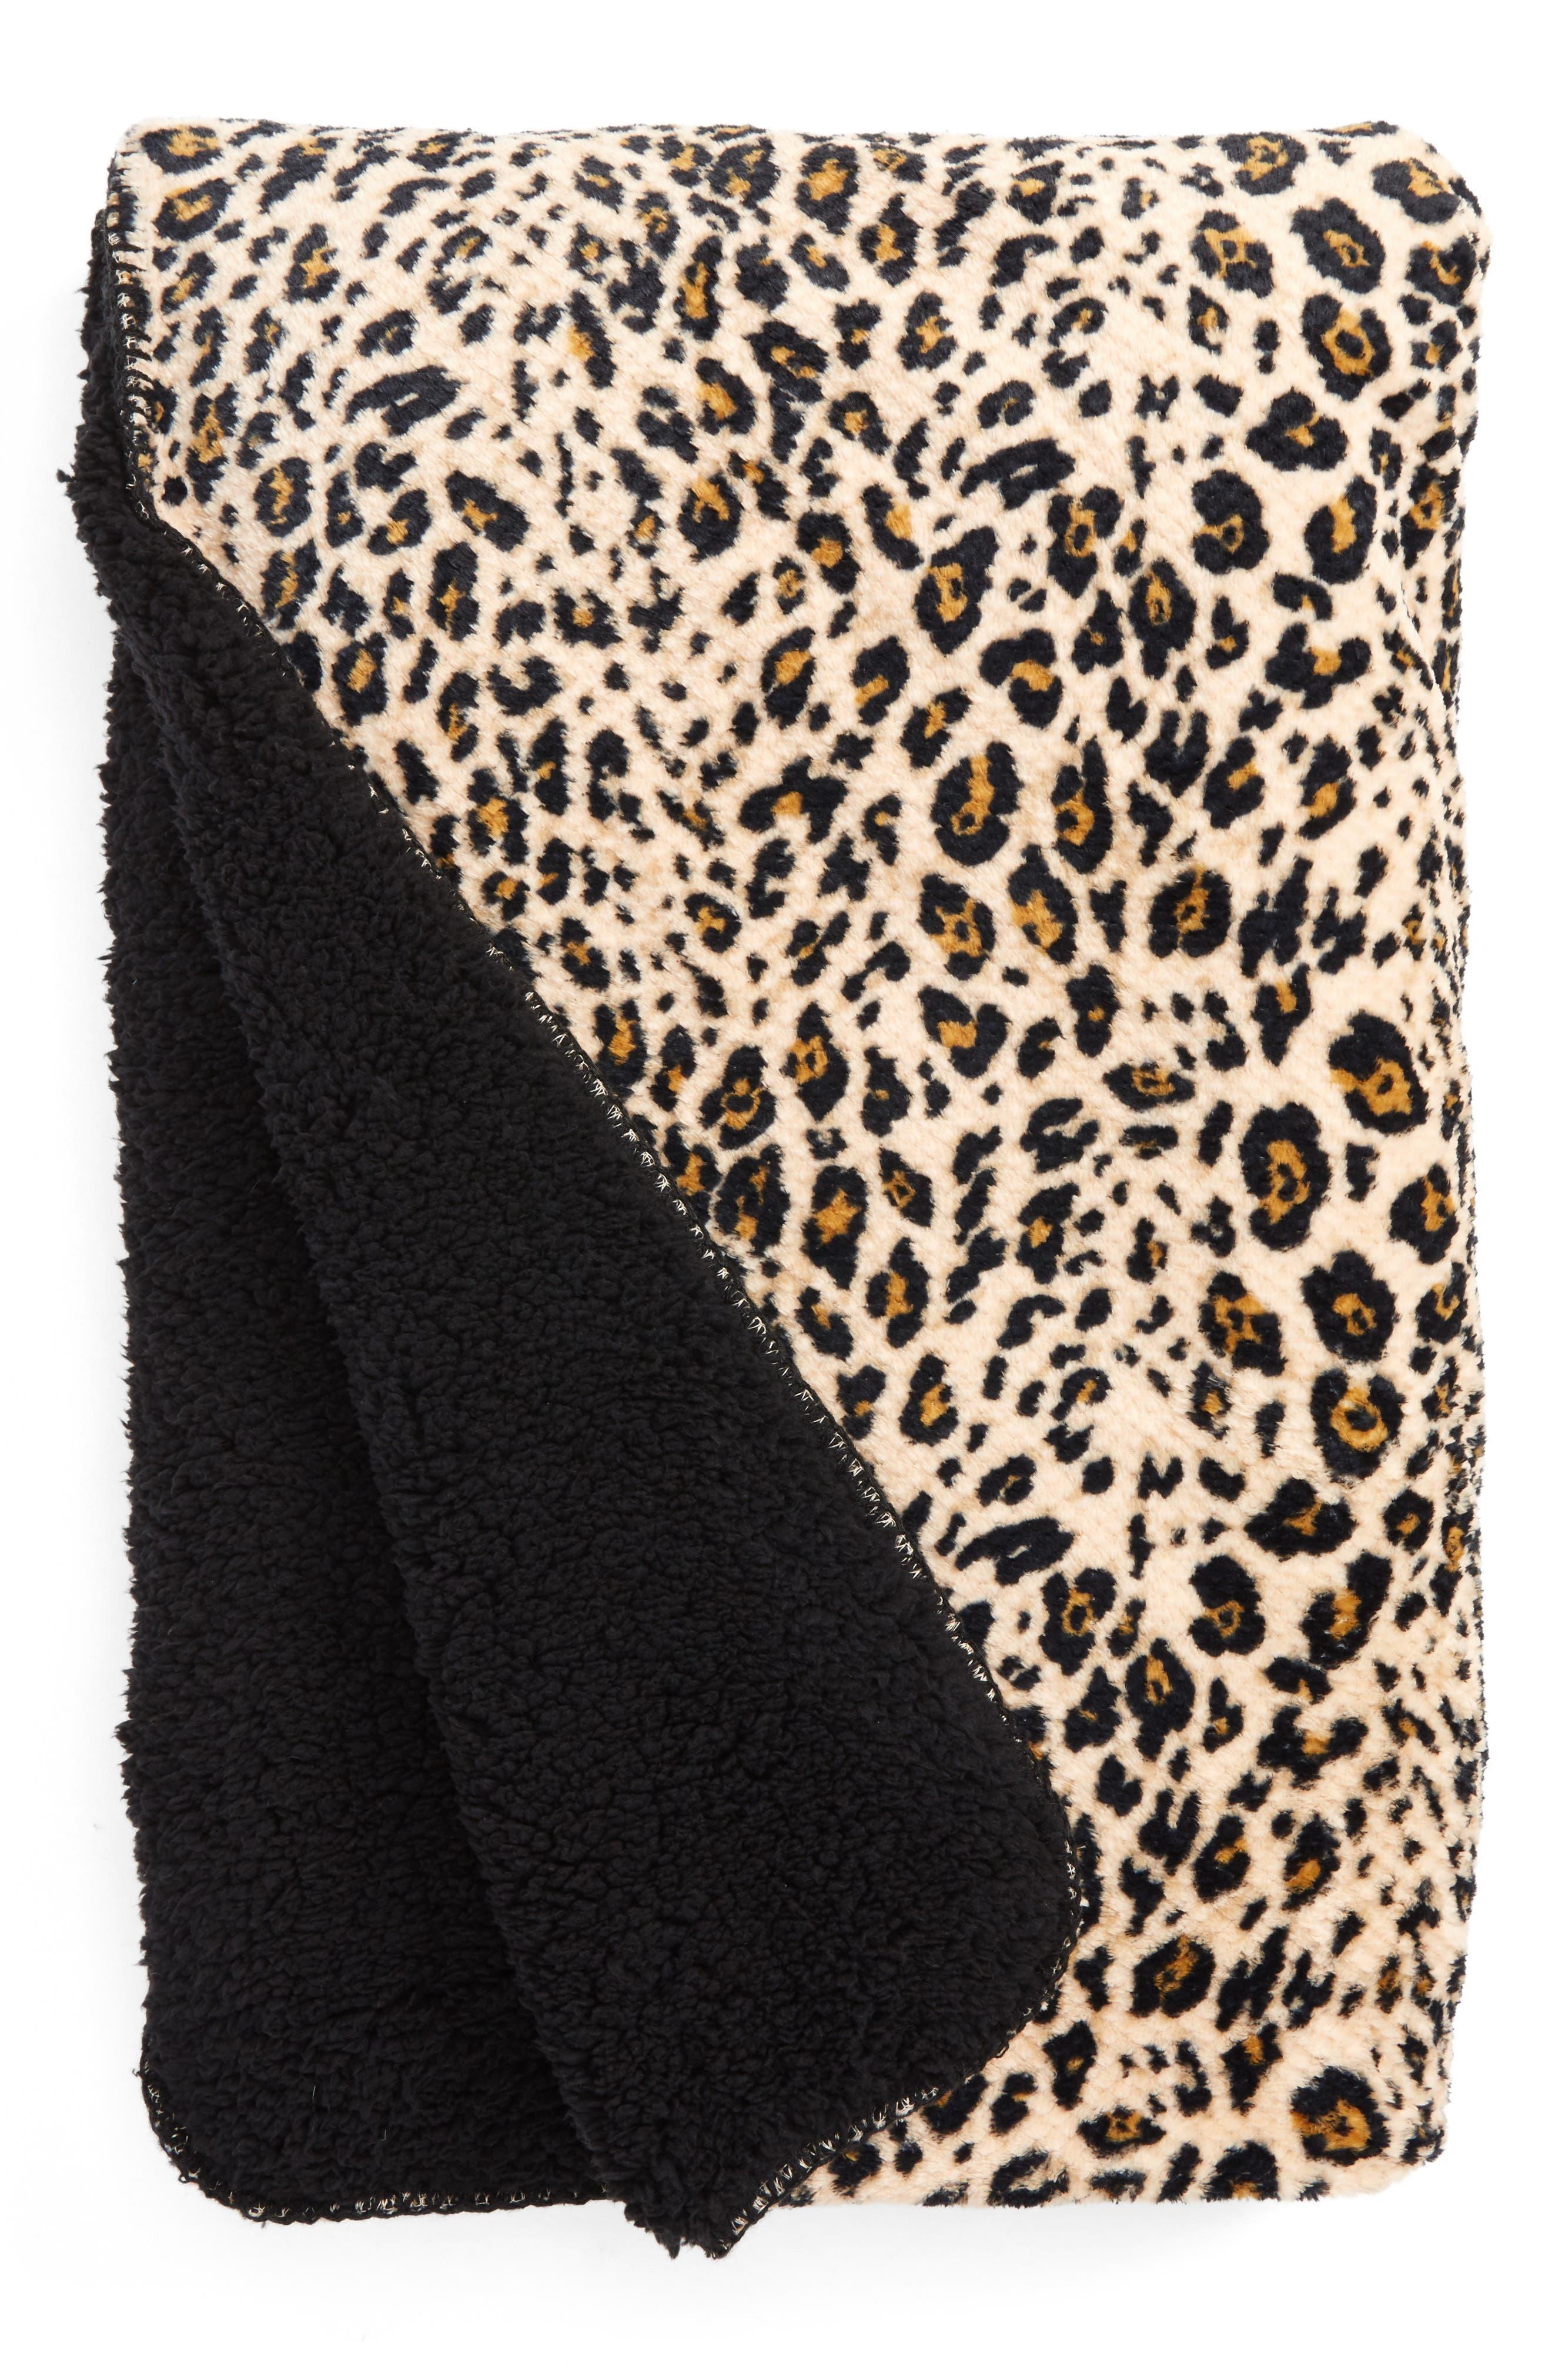 Leopard Print Faux Shearling Blanket,                         Main,                         color, Tan